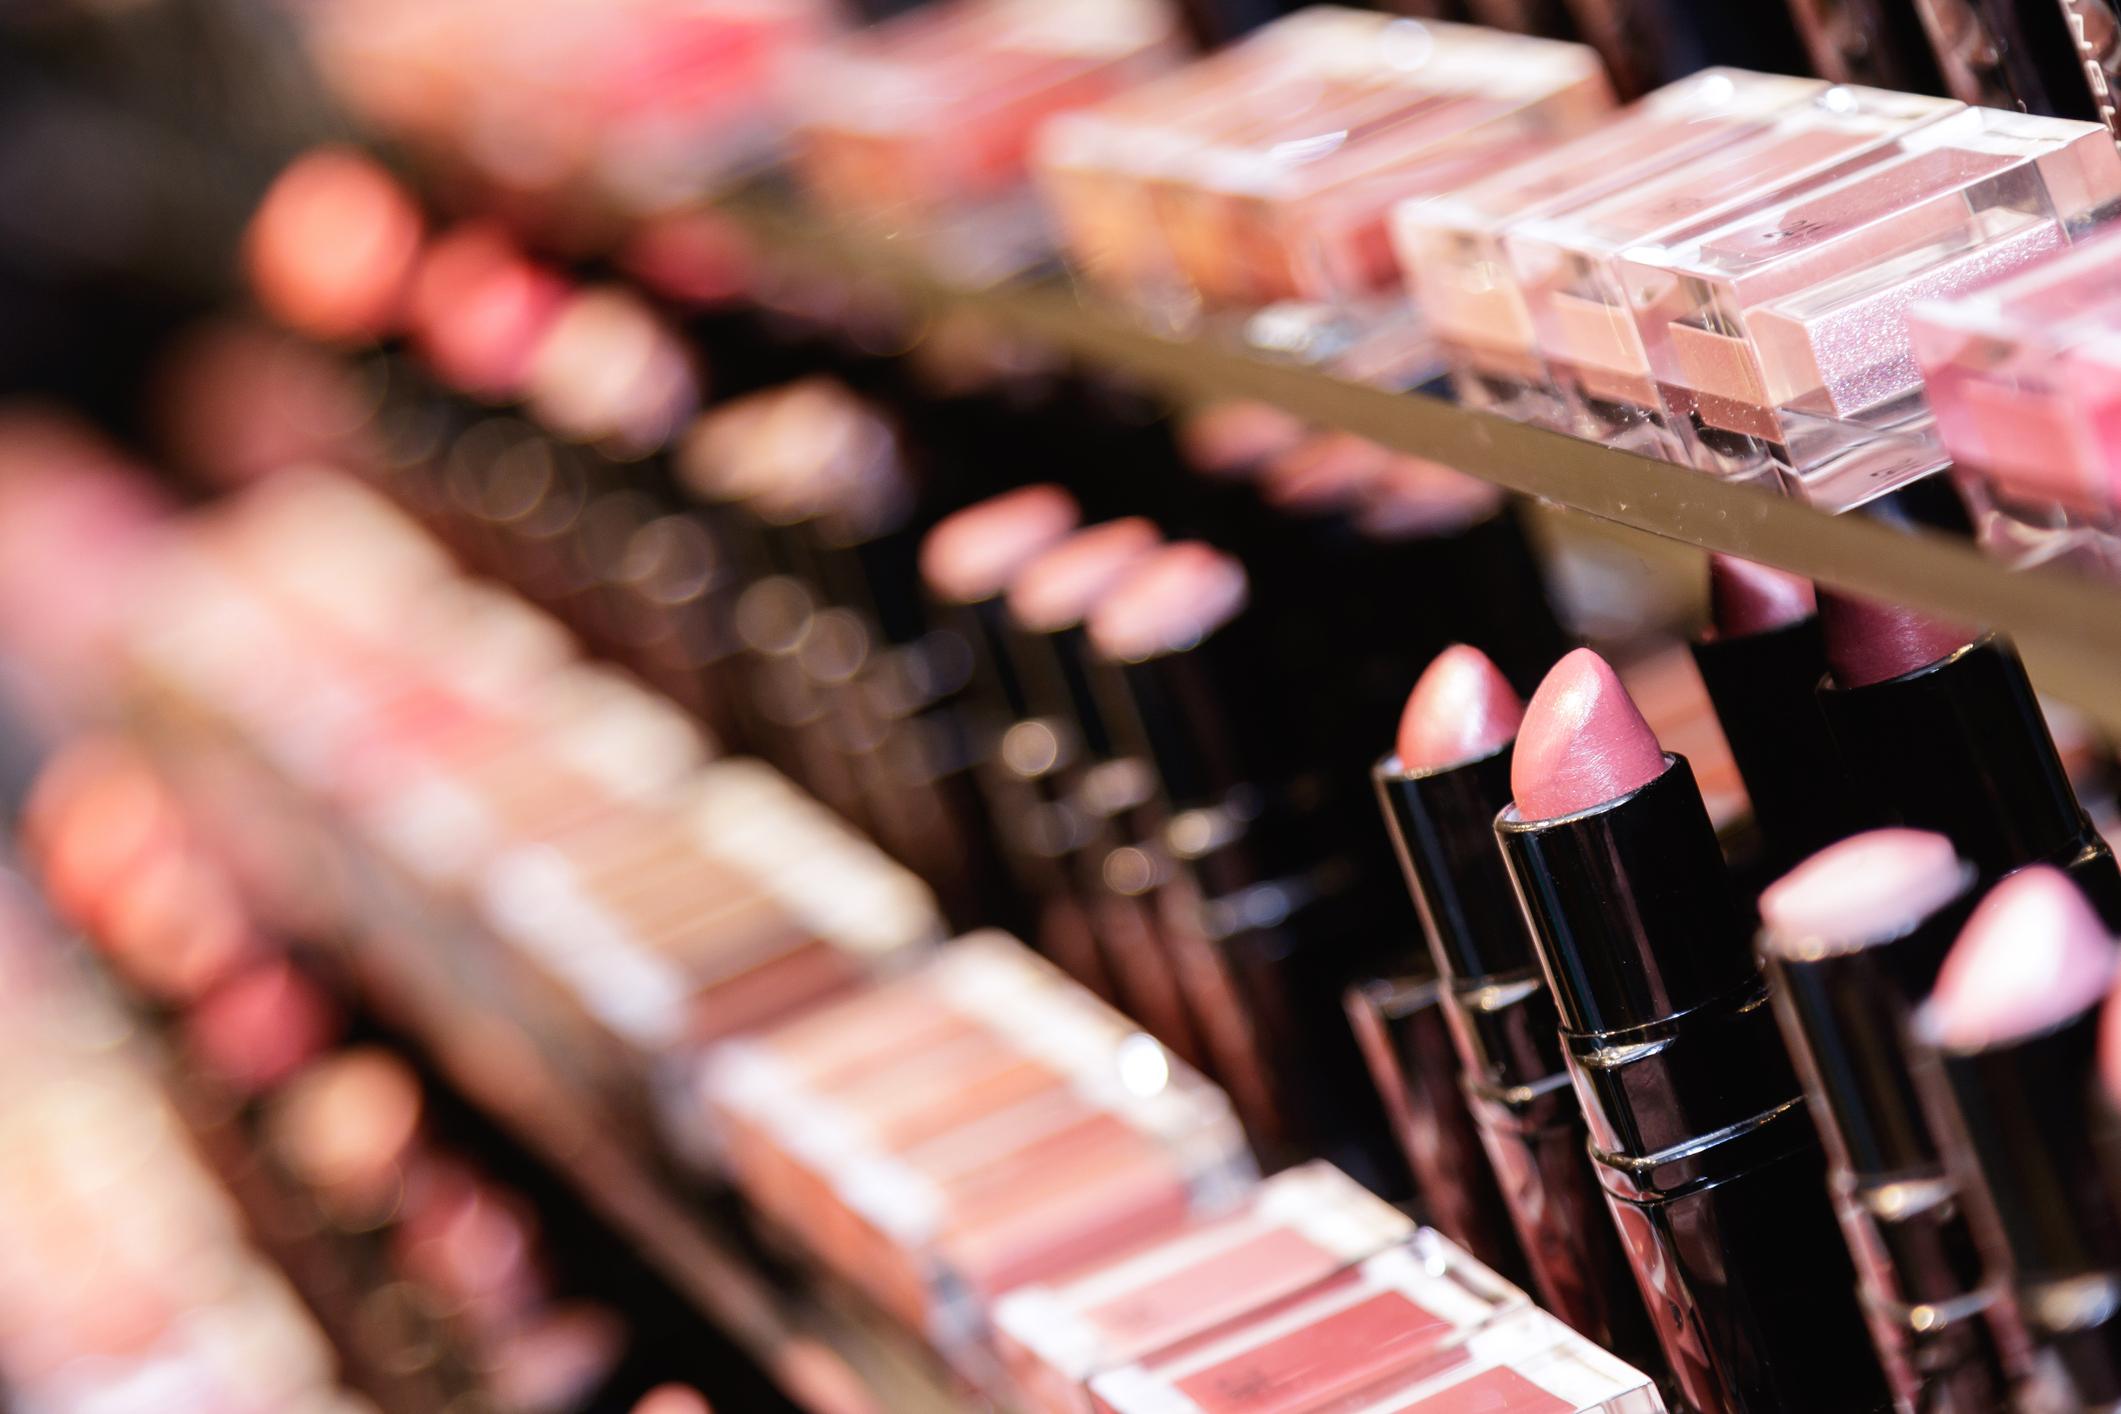 Ulta Cosmetics